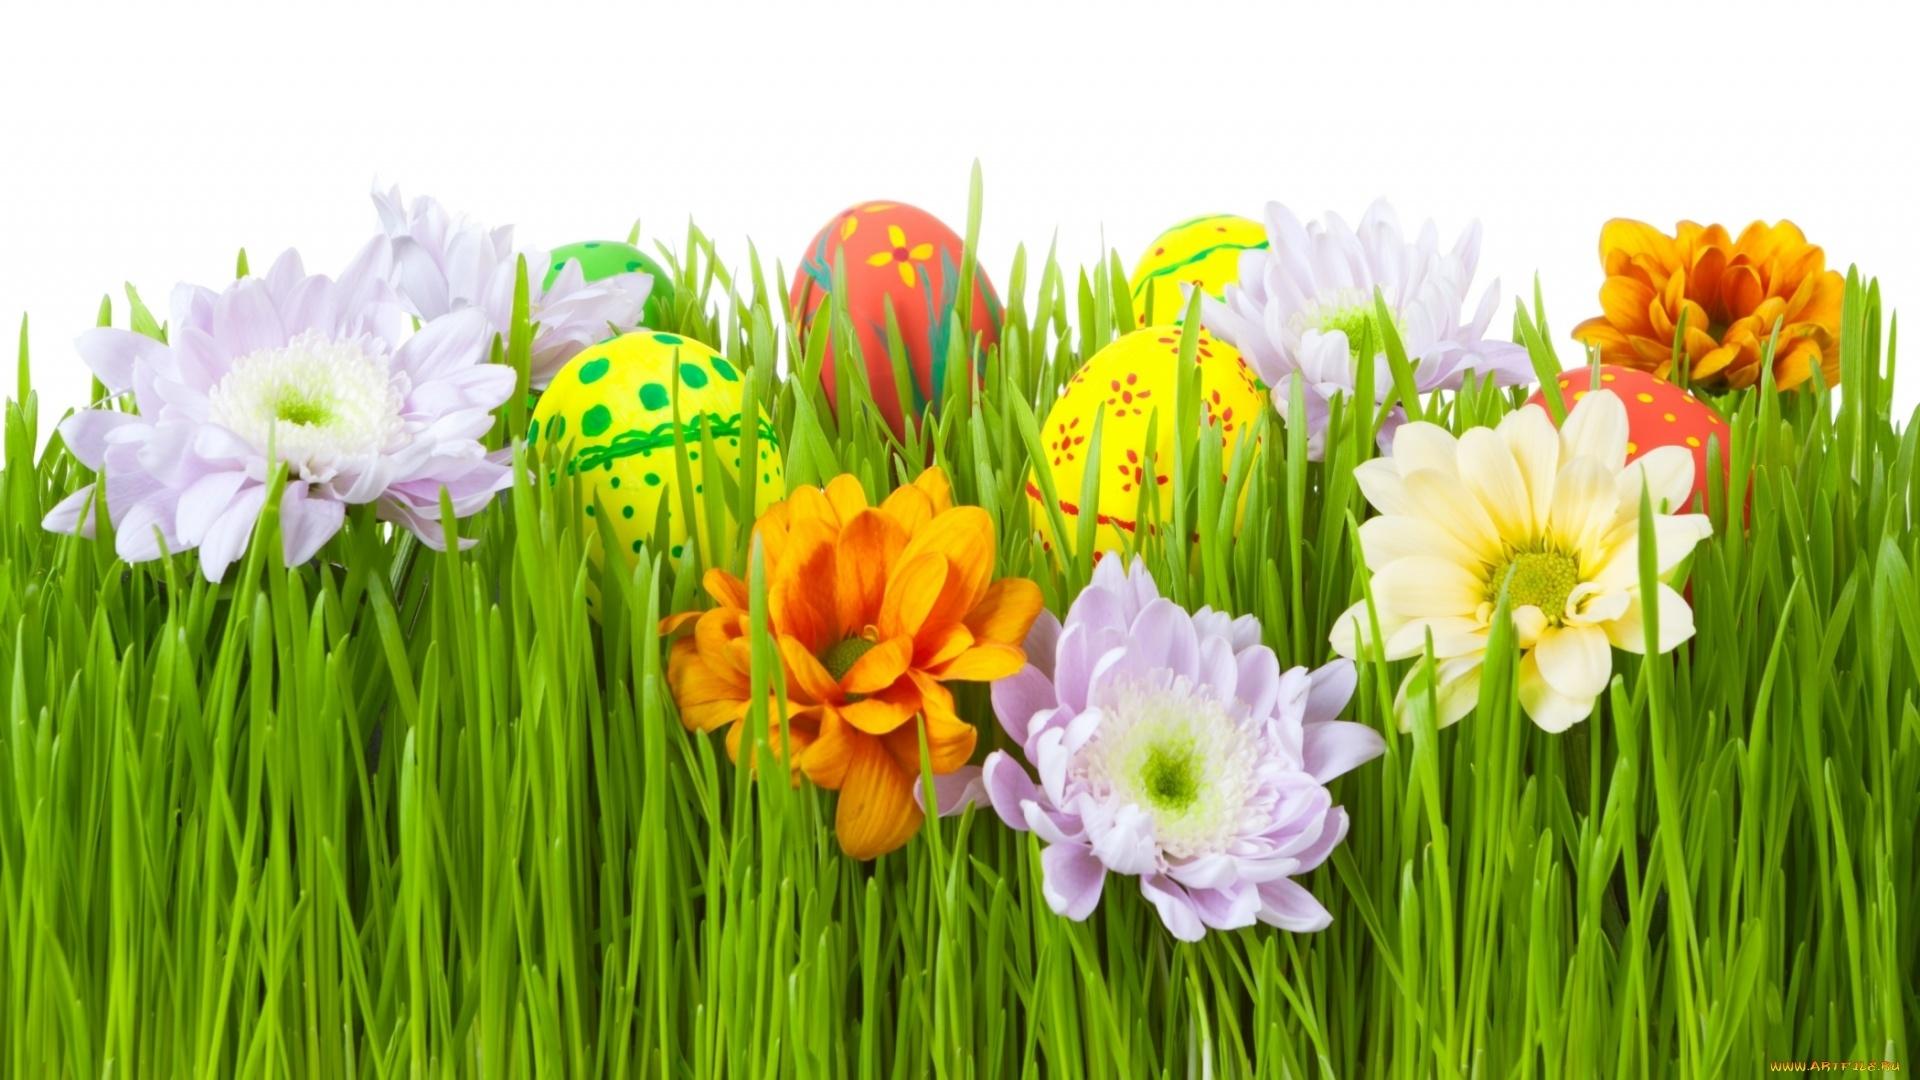 Easter Flowers Desktop Wallpaper